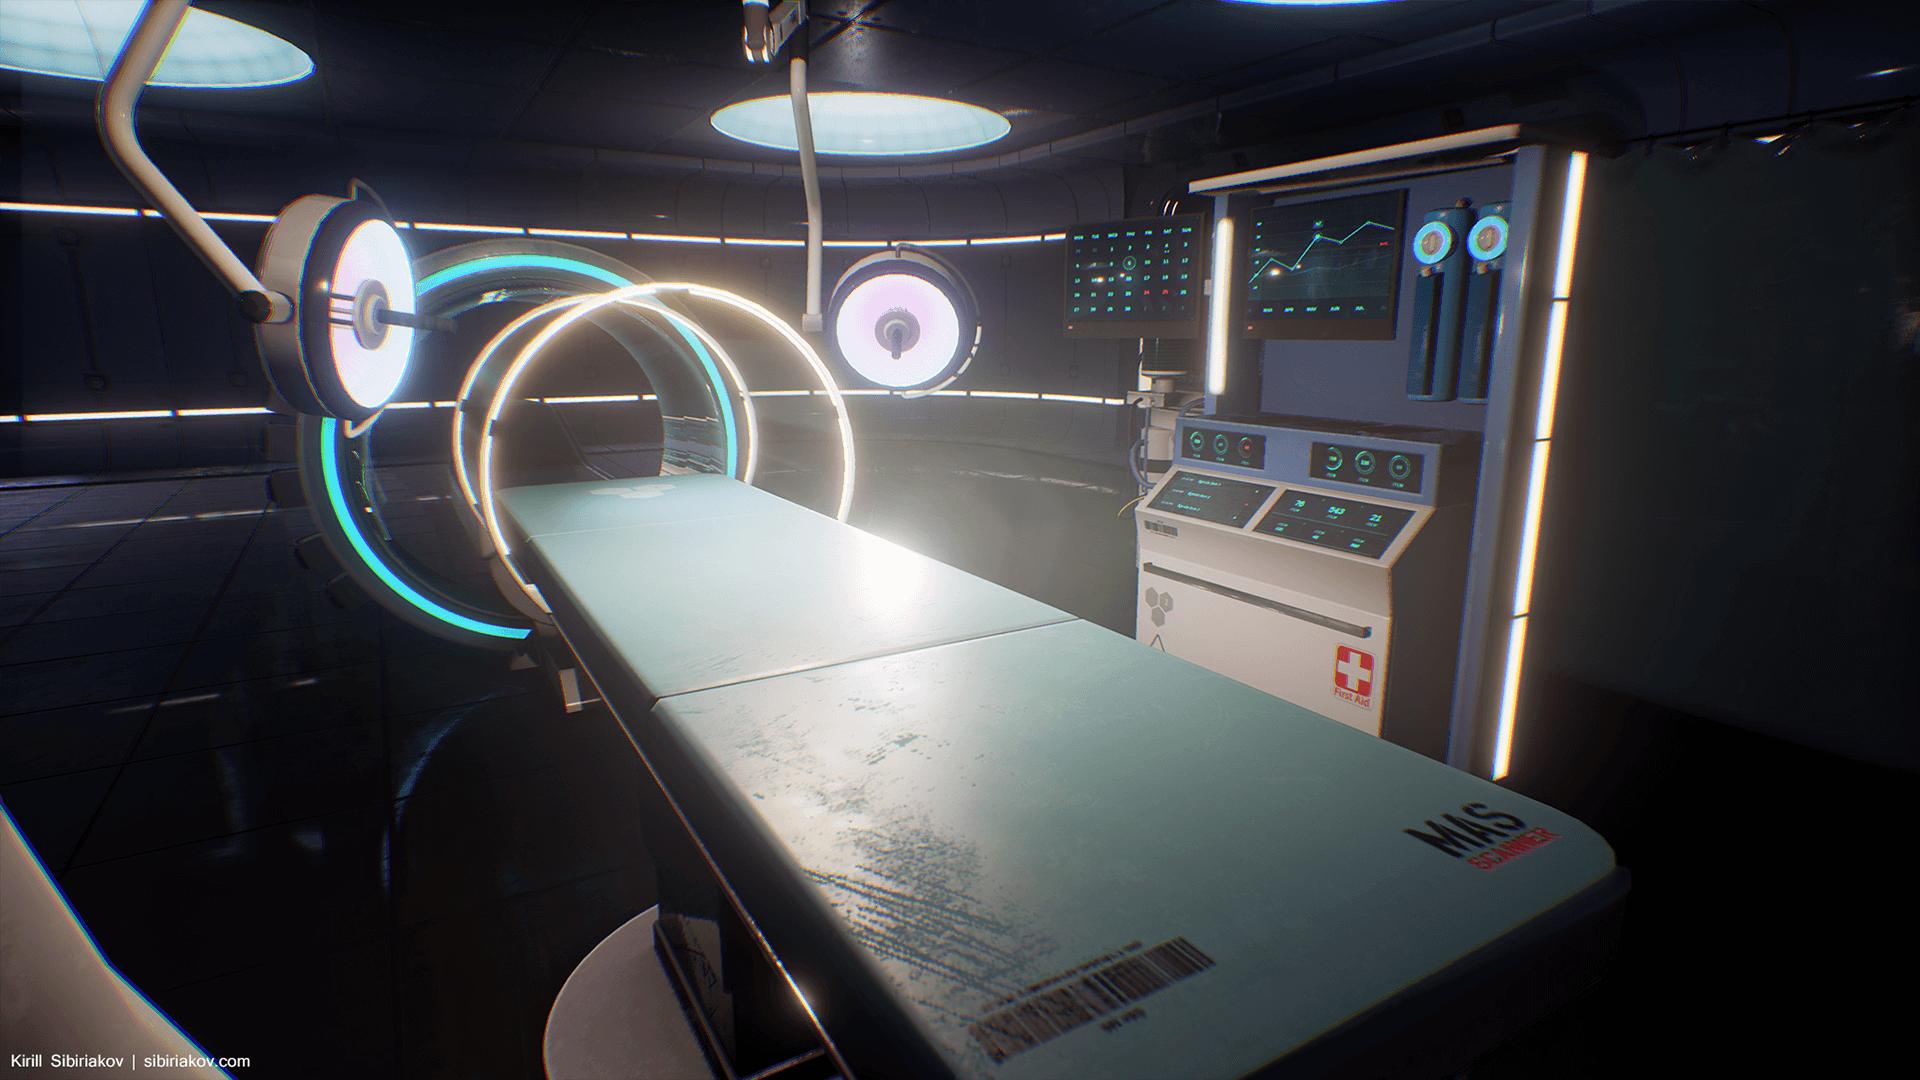 Sci Fi Hospital Room : Modular sci fi hospital by kirill sibiriakov in